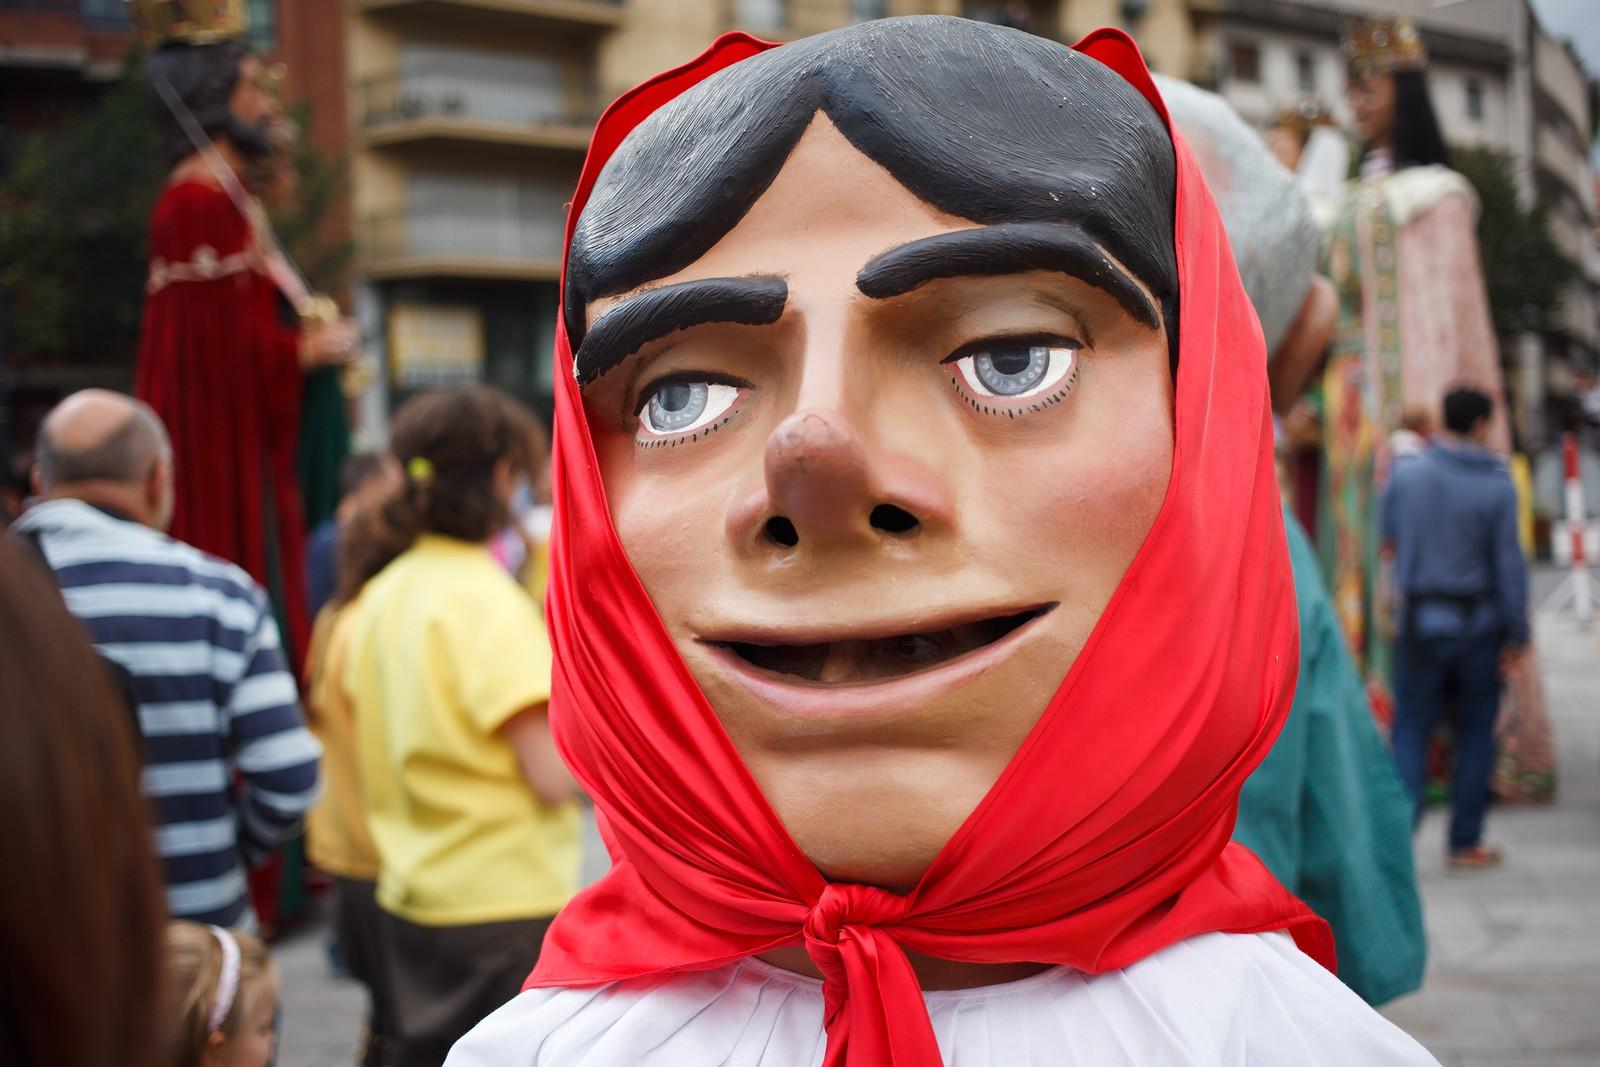 Фестиваль Святого Нарцисса в Жироне http://travelcalendar.ru/wp-content/uploads/2015/09/Girona-Trobada-de-Gegants-Fires-de-Sant-Narcis-A2-Partners-007.jpg